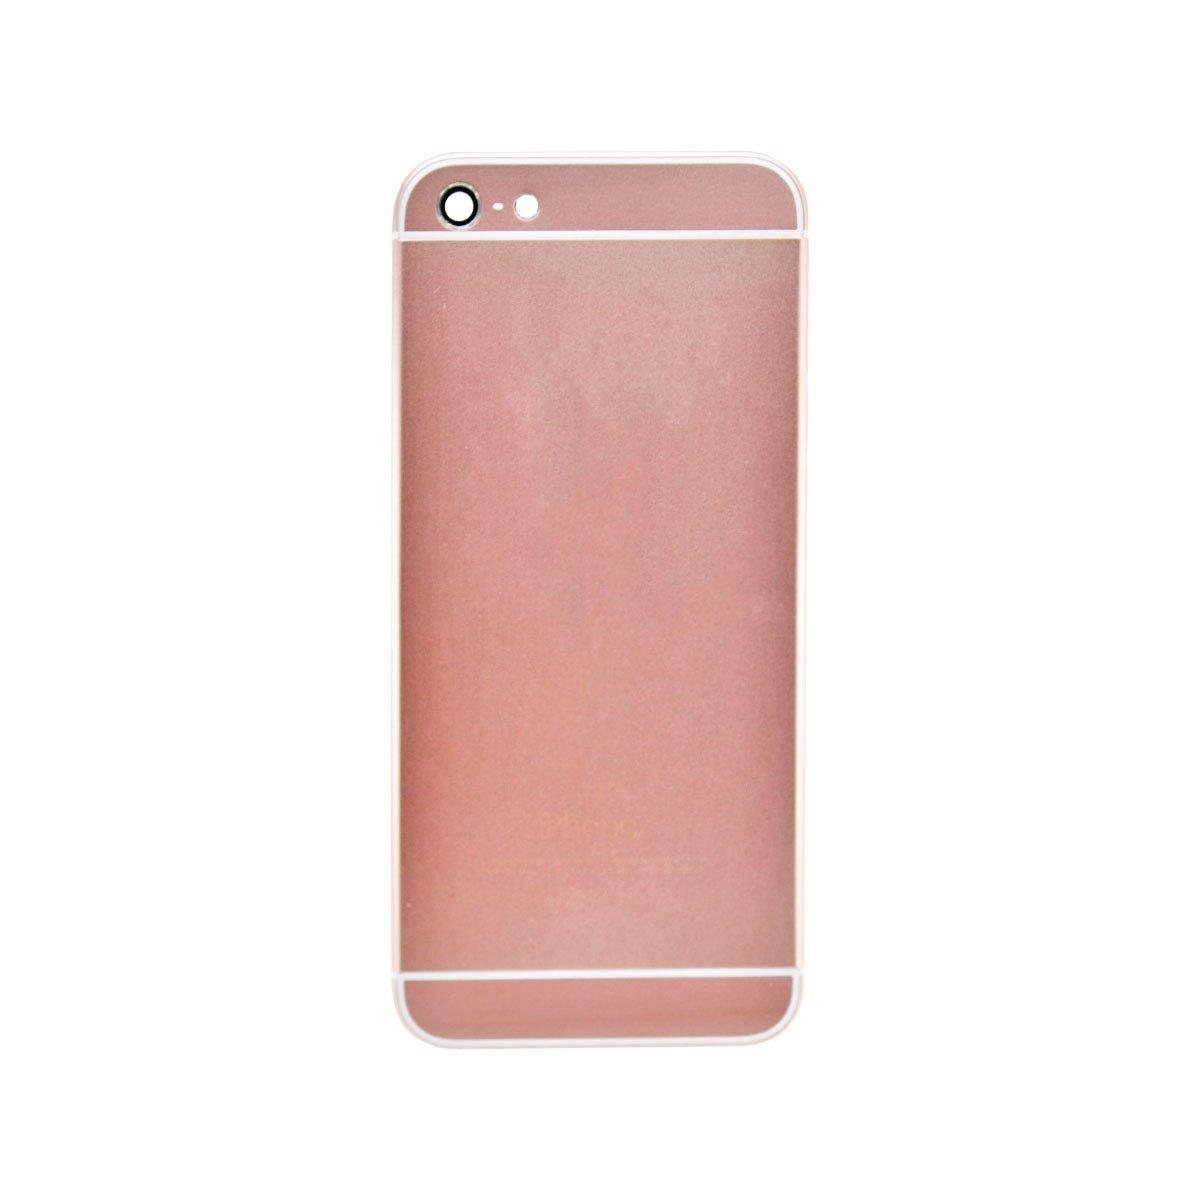 Корпус для Apple iPhone 5 дизайн Iphone 6 (розовый)